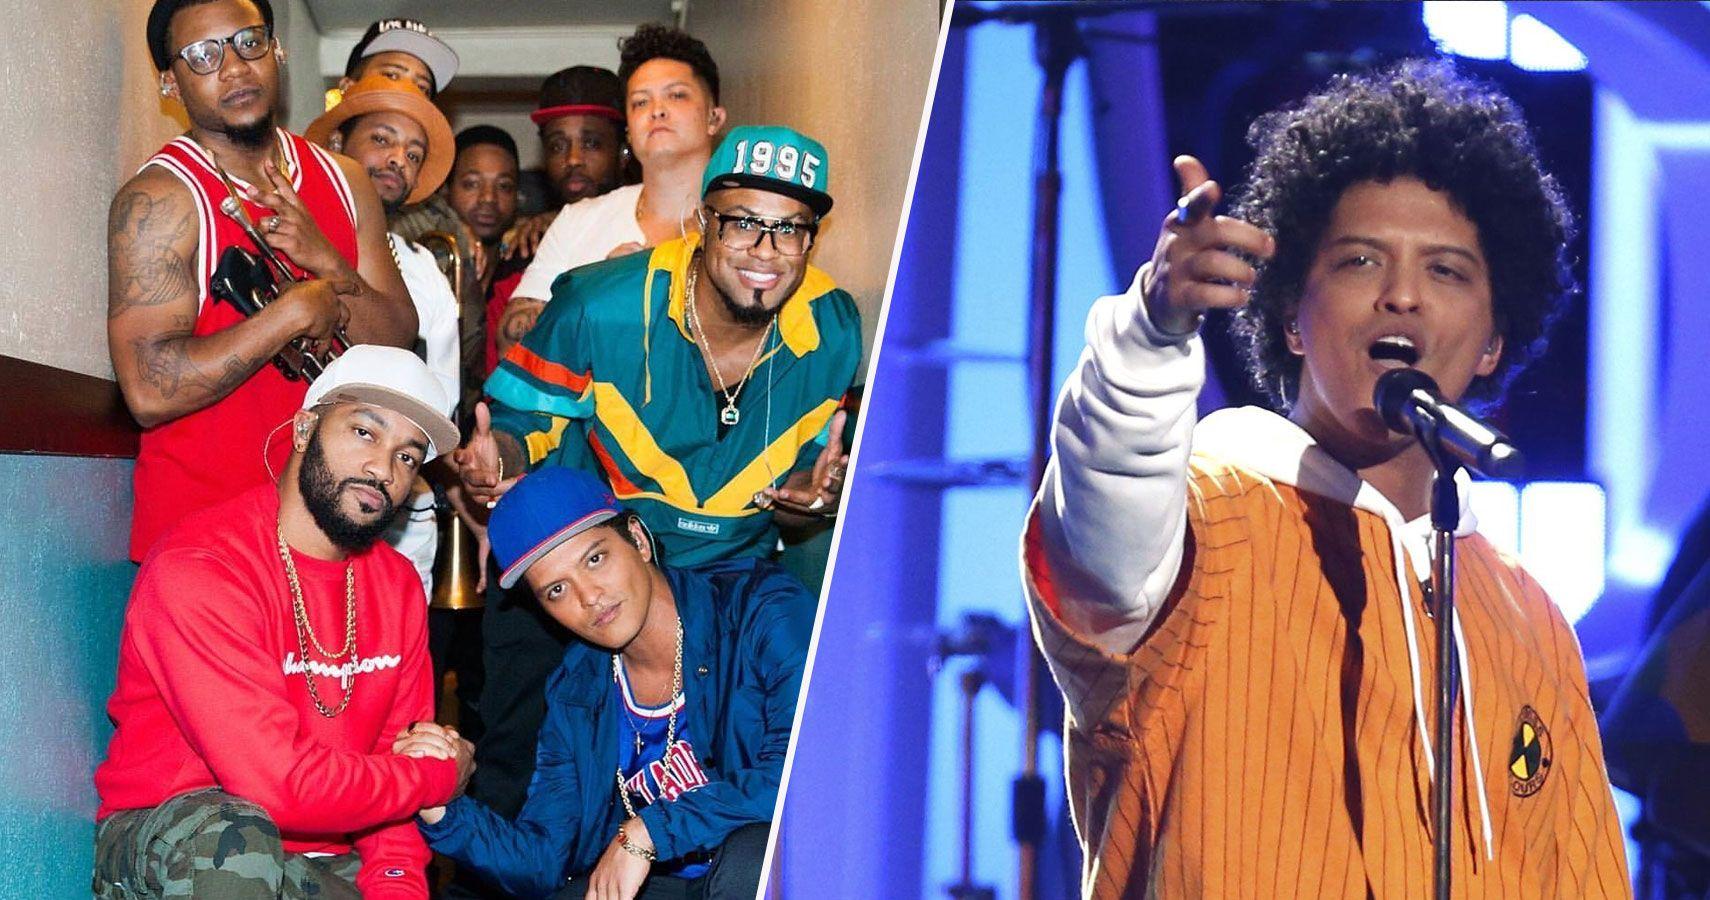 Meet The Hooligans: The Band Behind Bruno Mars' Showmanship